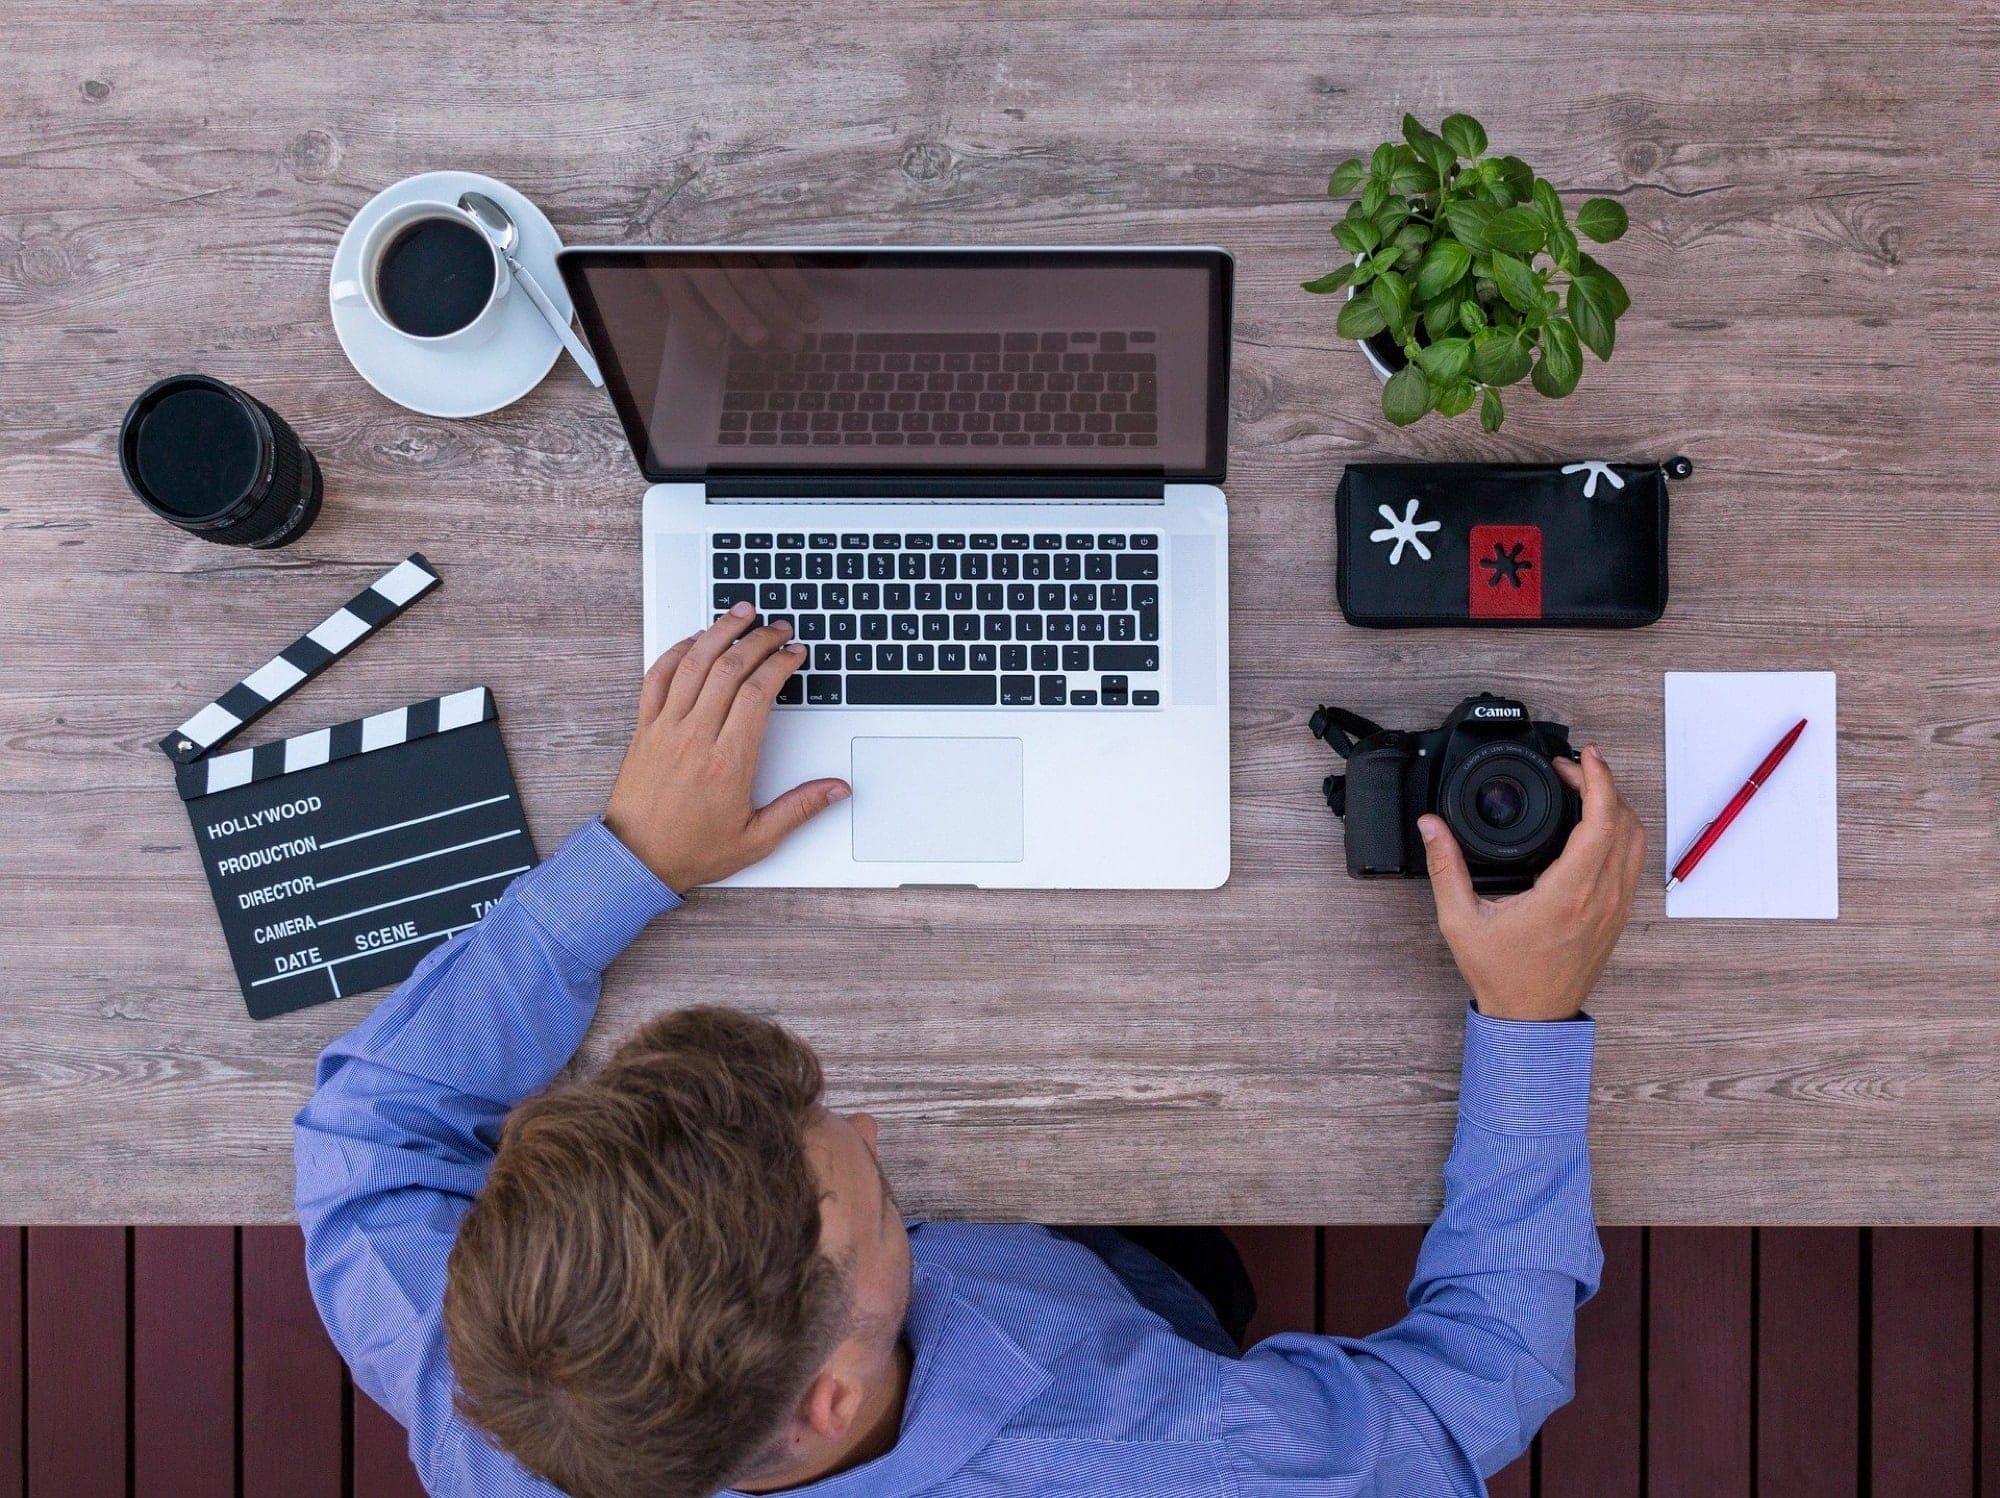 MacBook keyboard movie media- QuickTime Player keyboard shortcuts